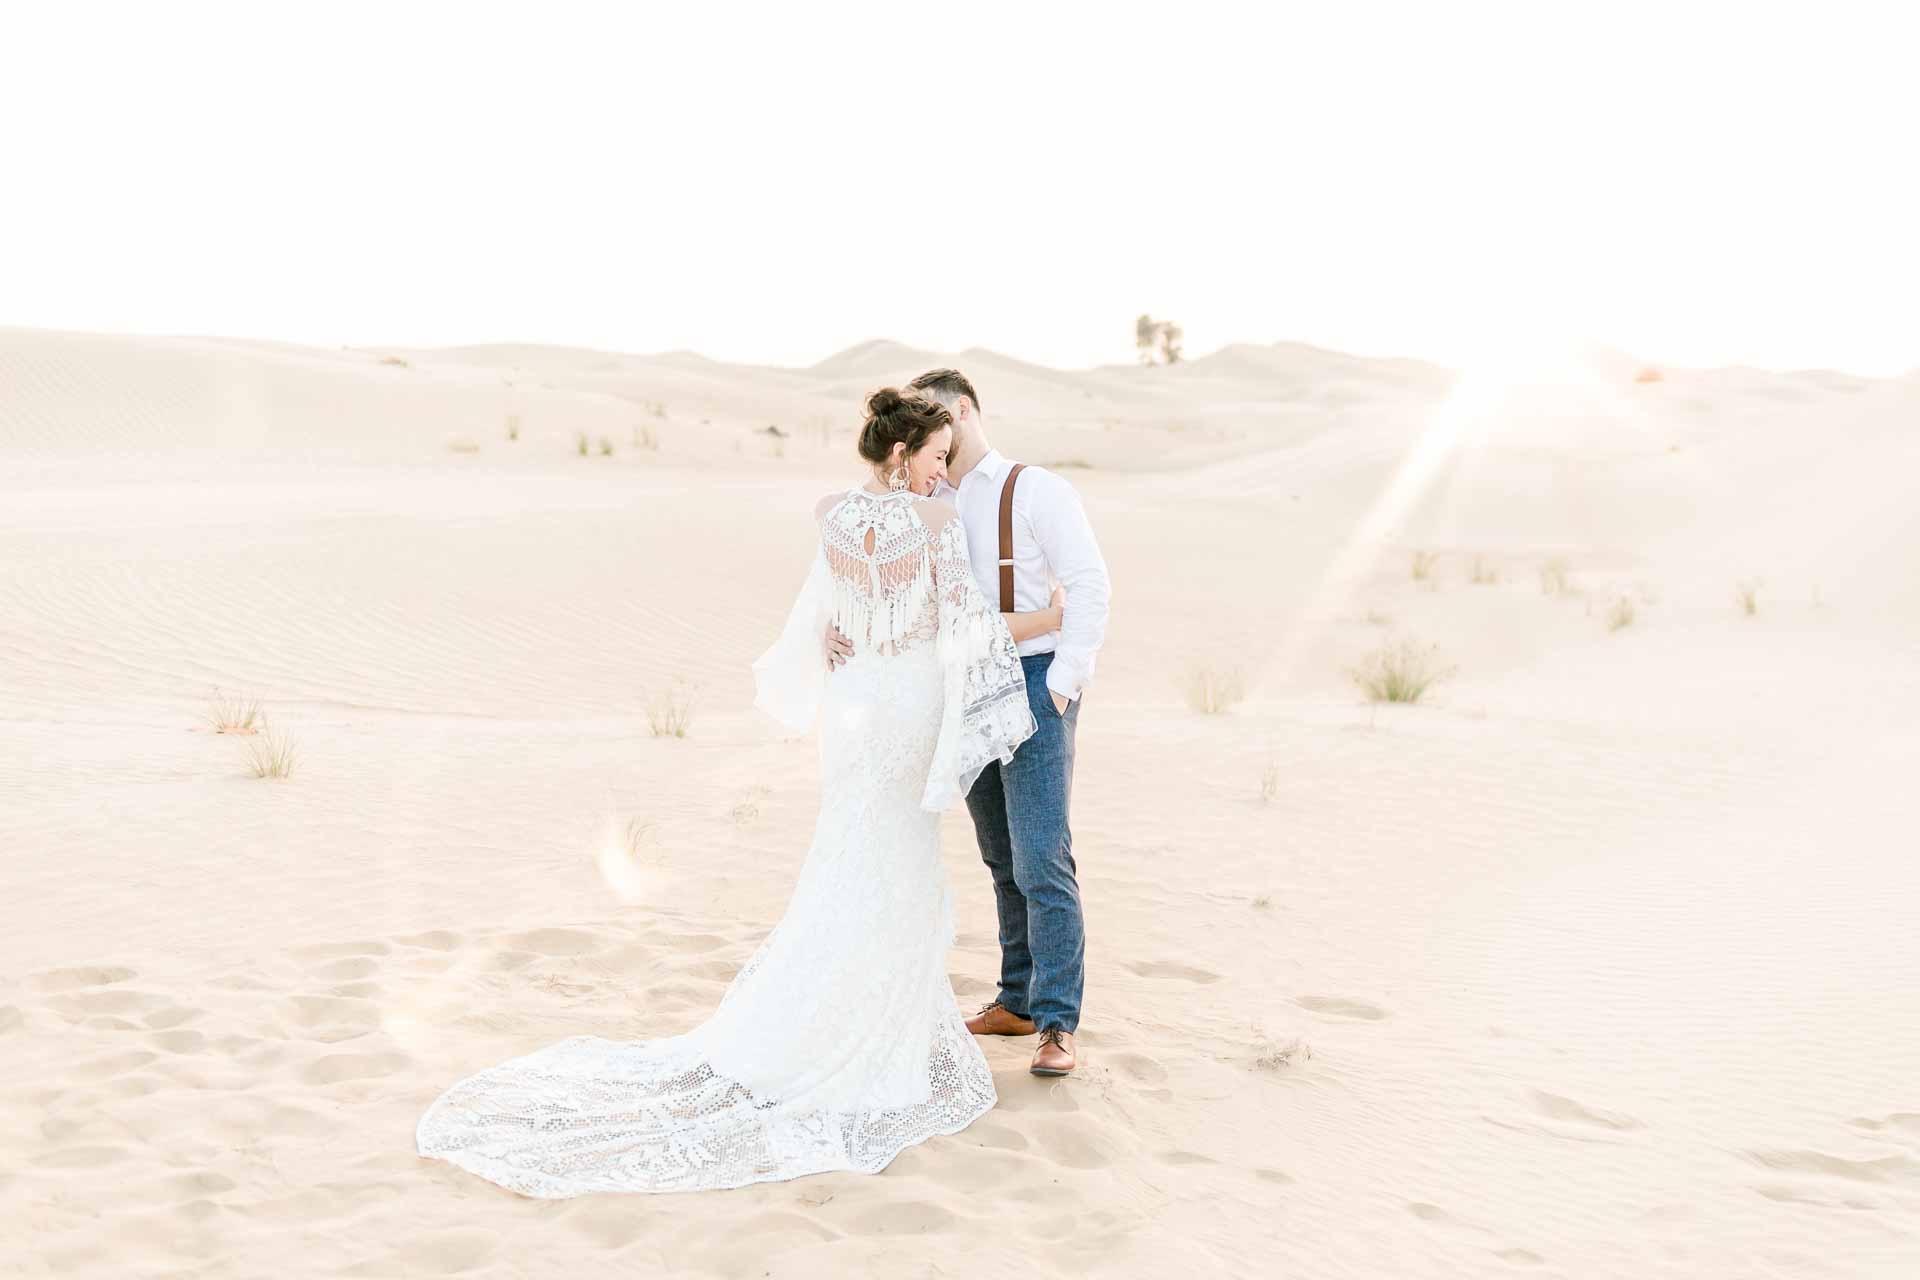 Dubai Ivory Ilse Bohohochzeit Mödling Hochzeit Bohokleid